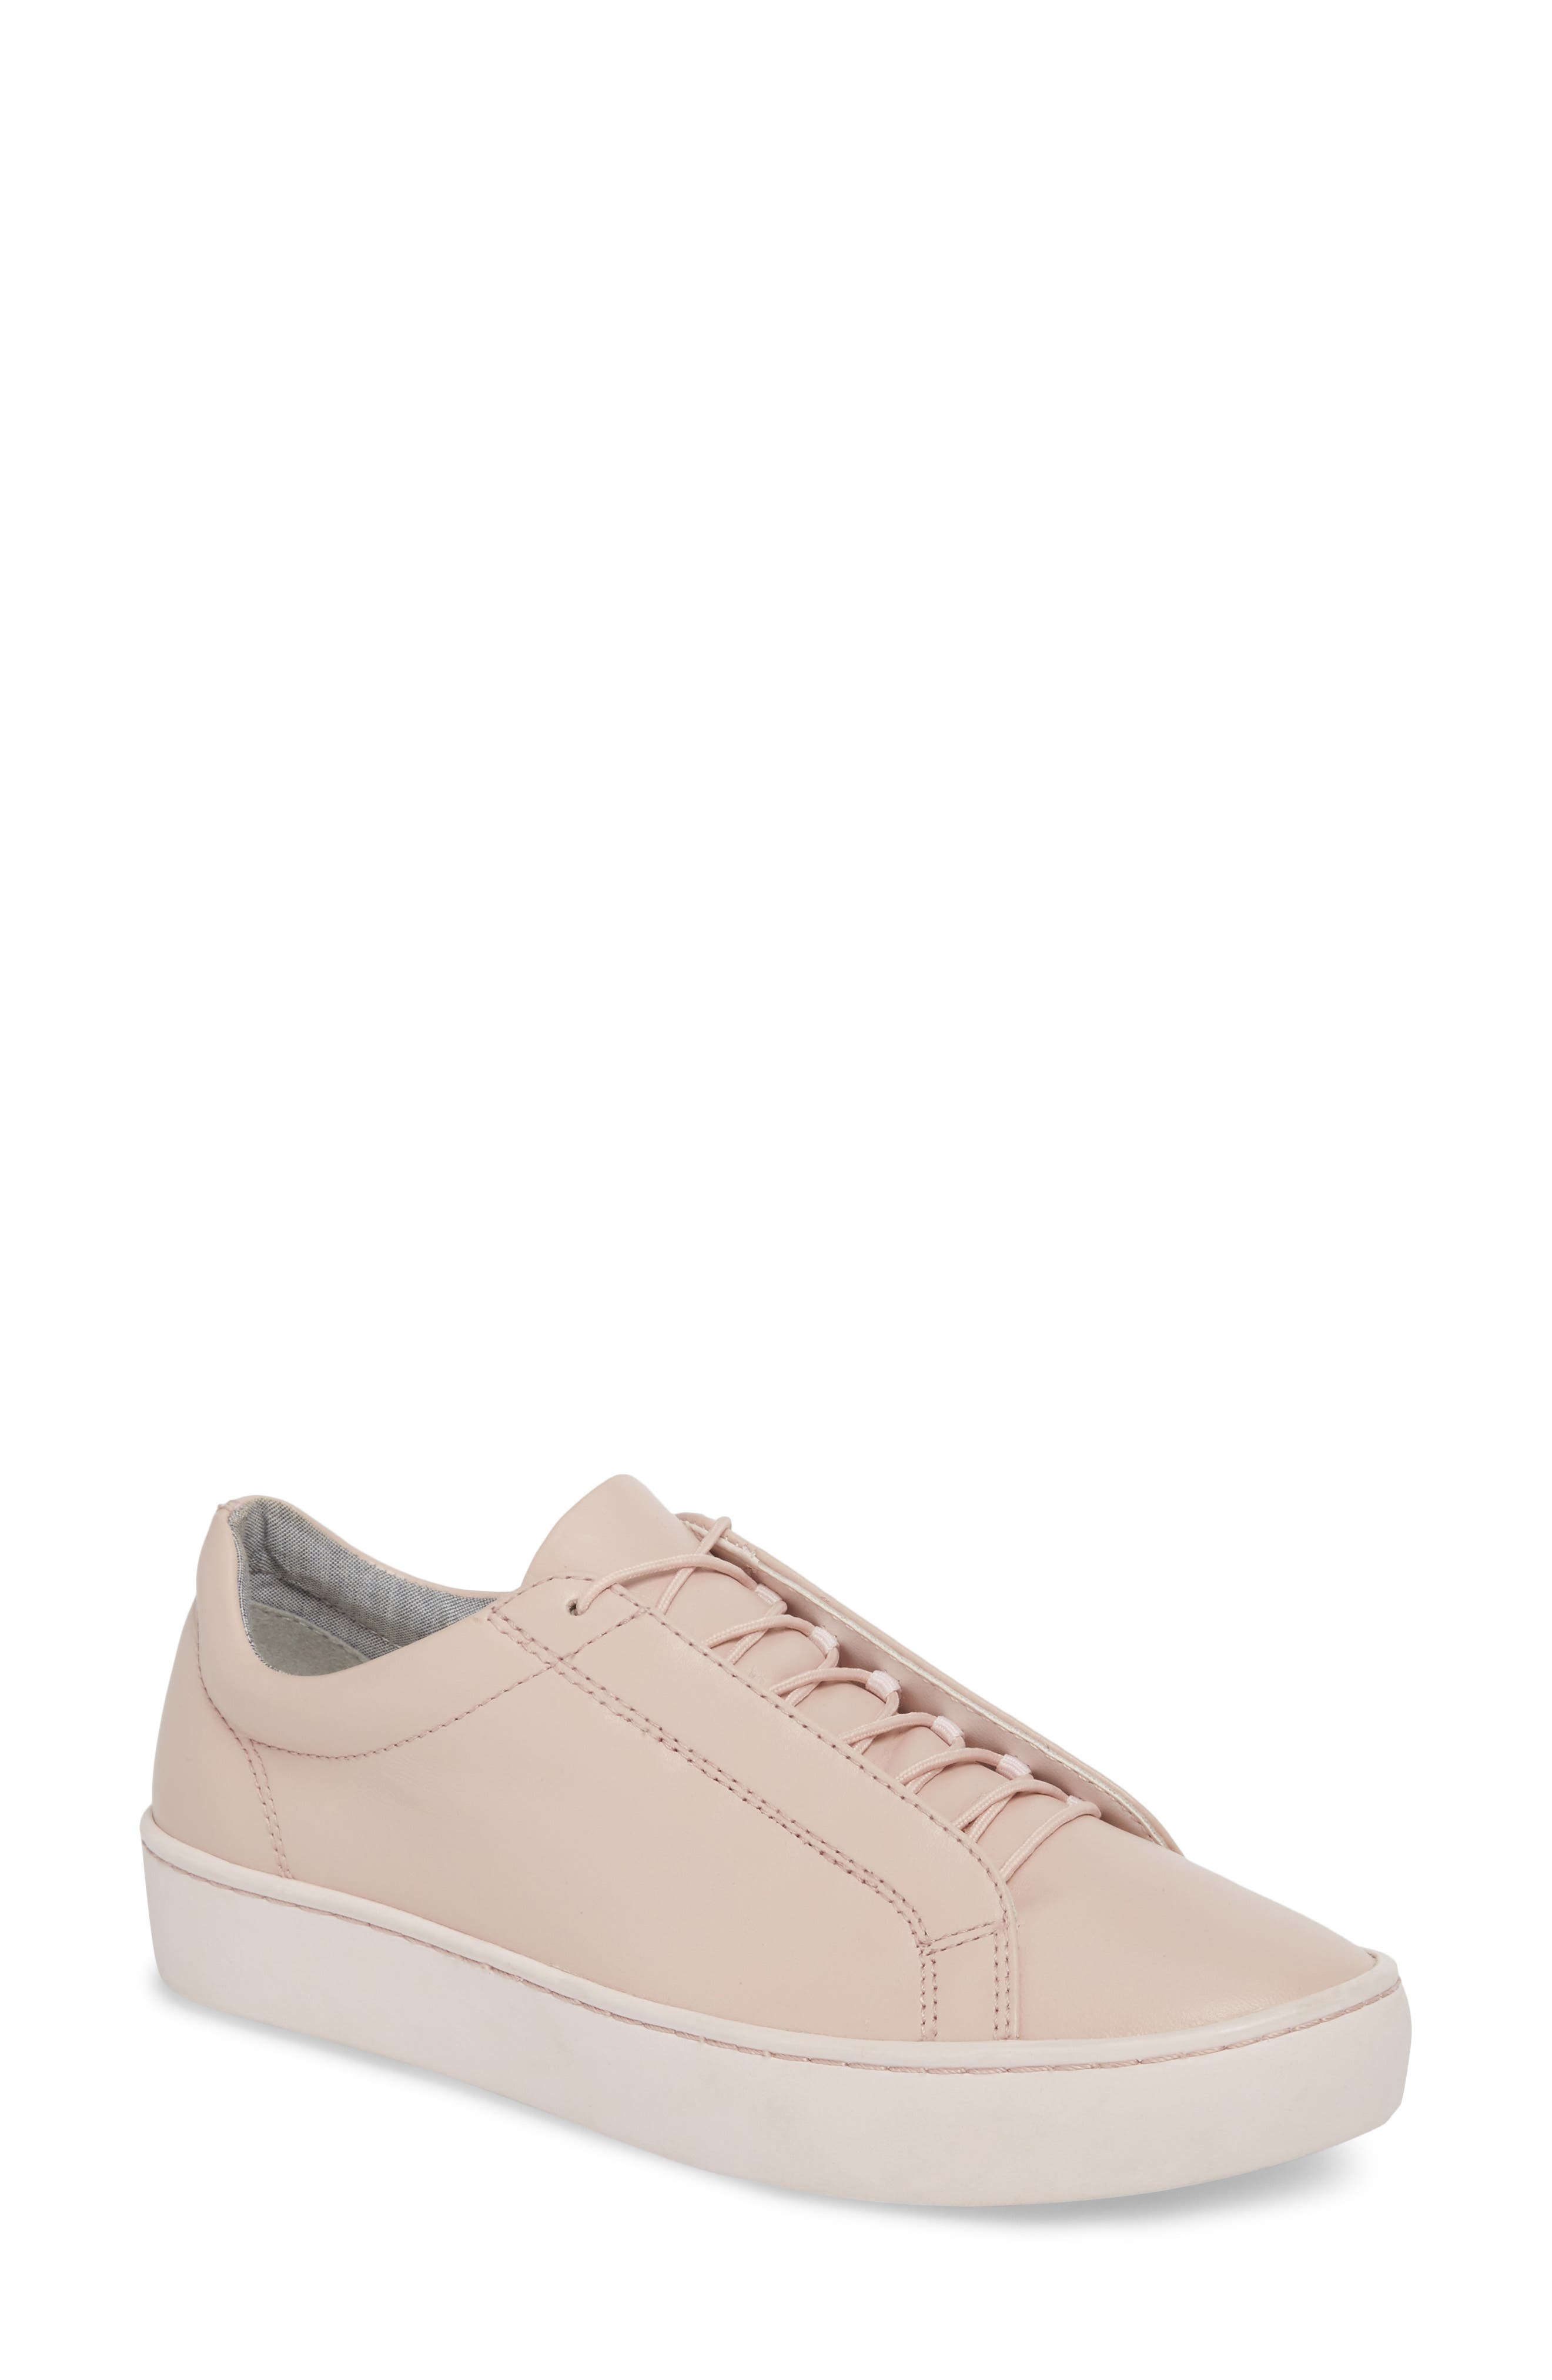 Zoe Sneaker,                         Main,                         color, Milkshake Leather